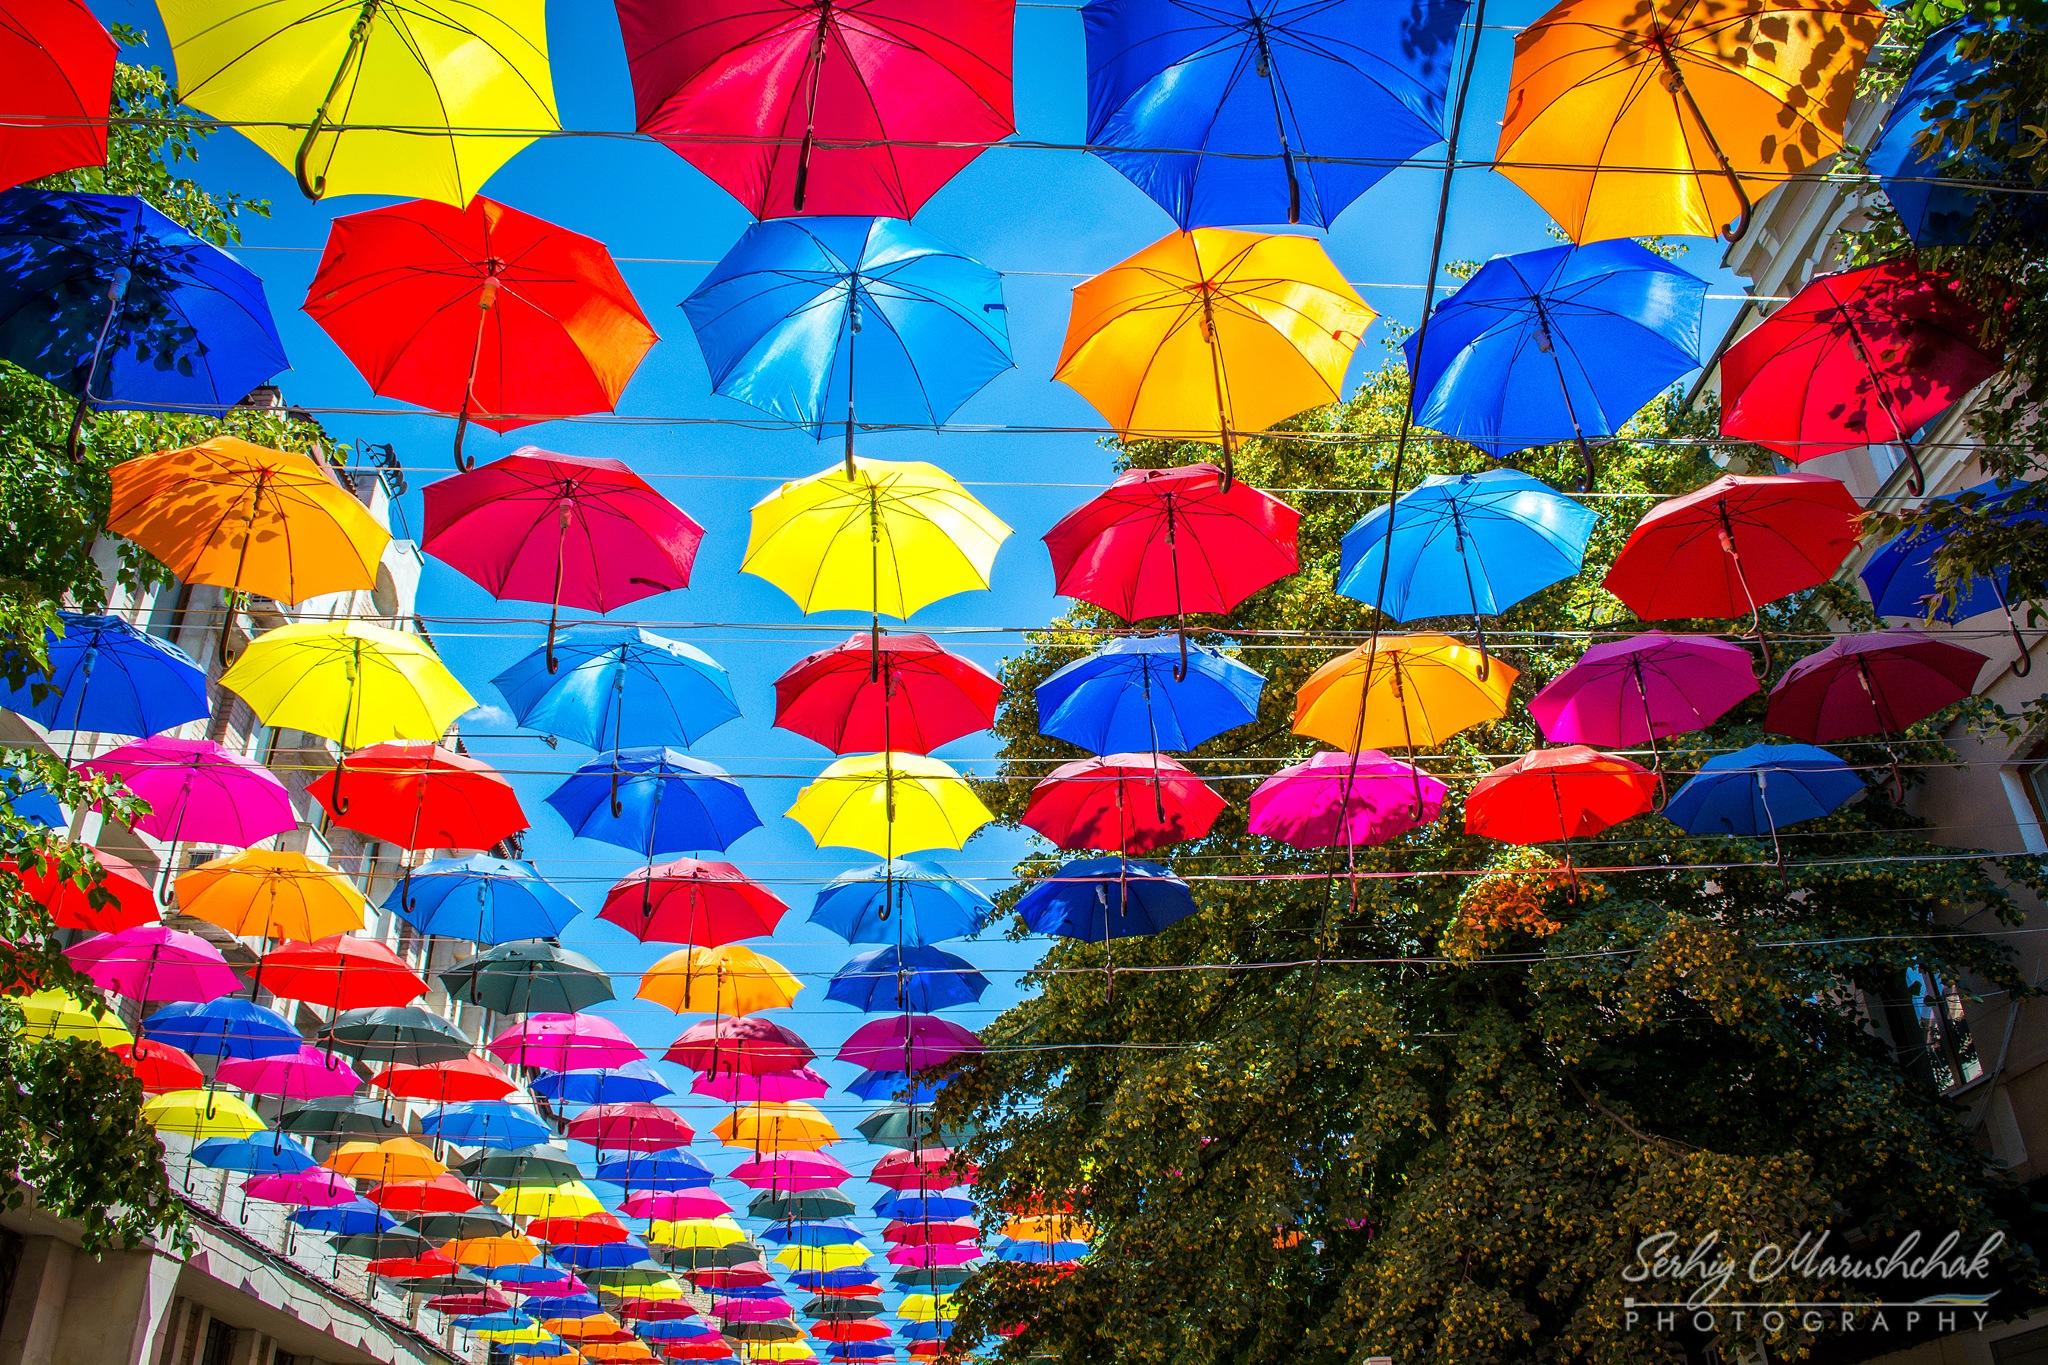 Яскраві парасольки... / Bright umbrellas... by artmars07